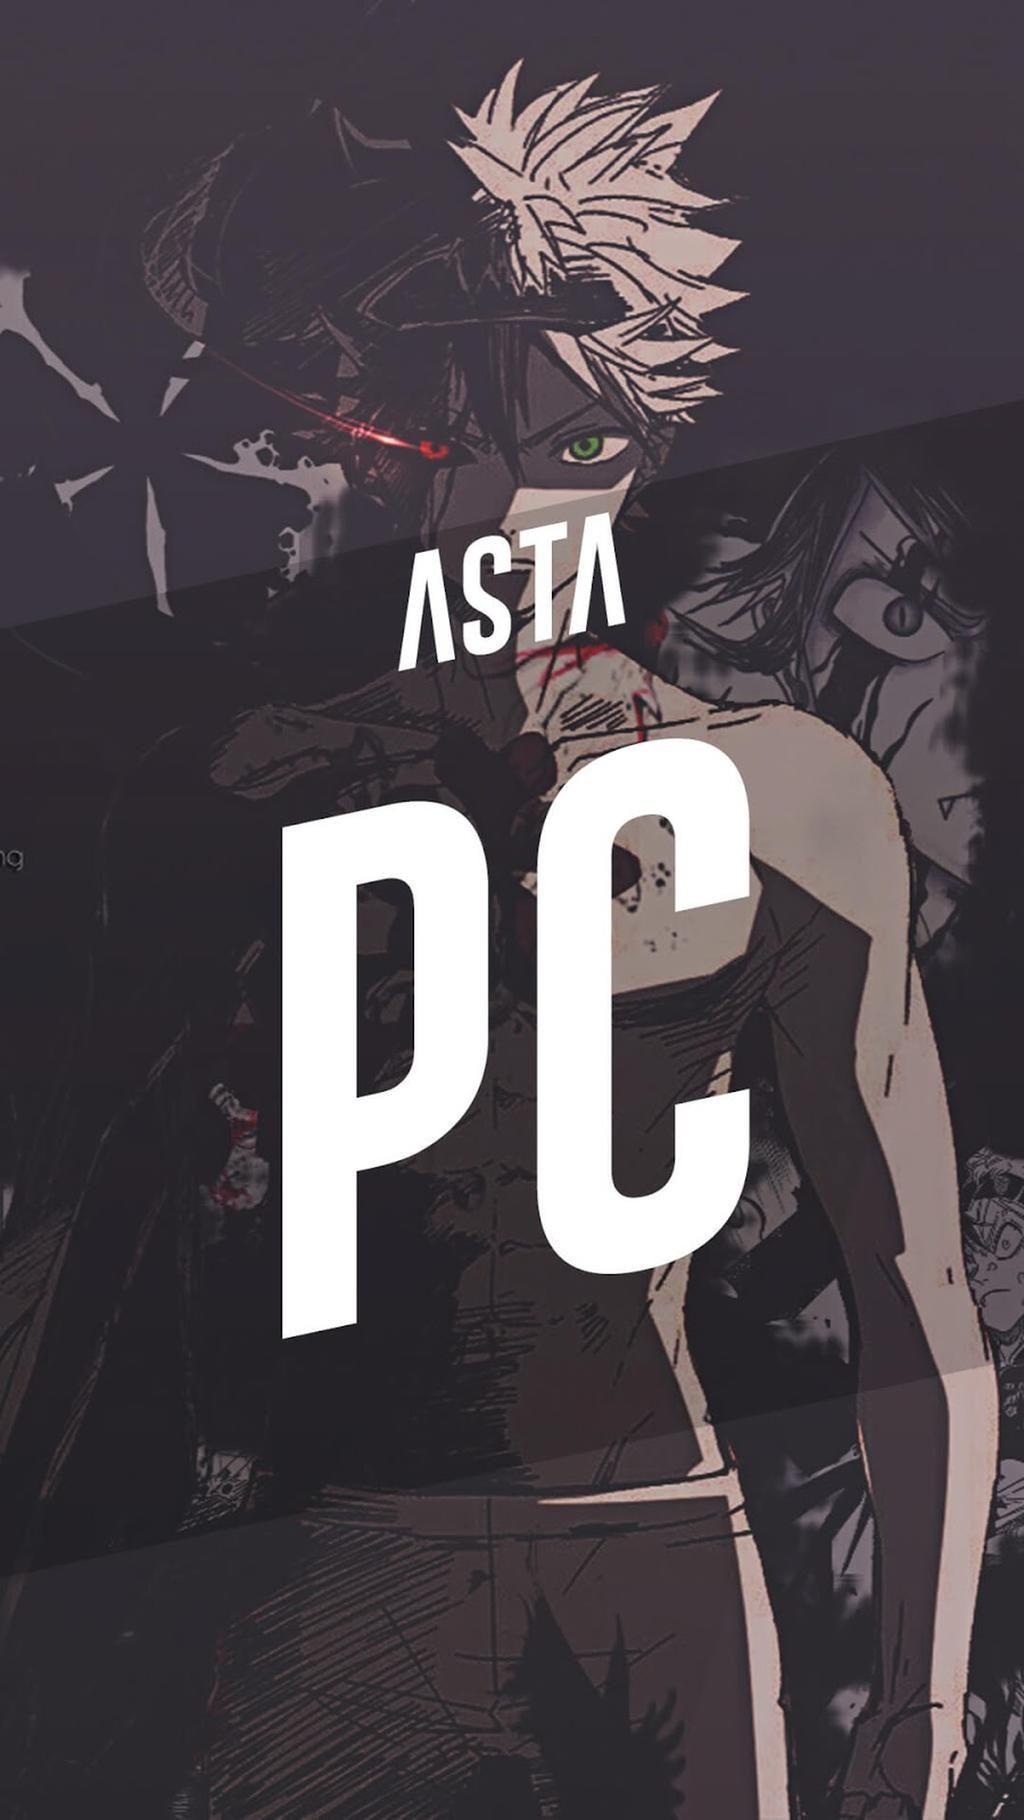 Asta Black Clover Wallpapers Top Free Asta Black Clover